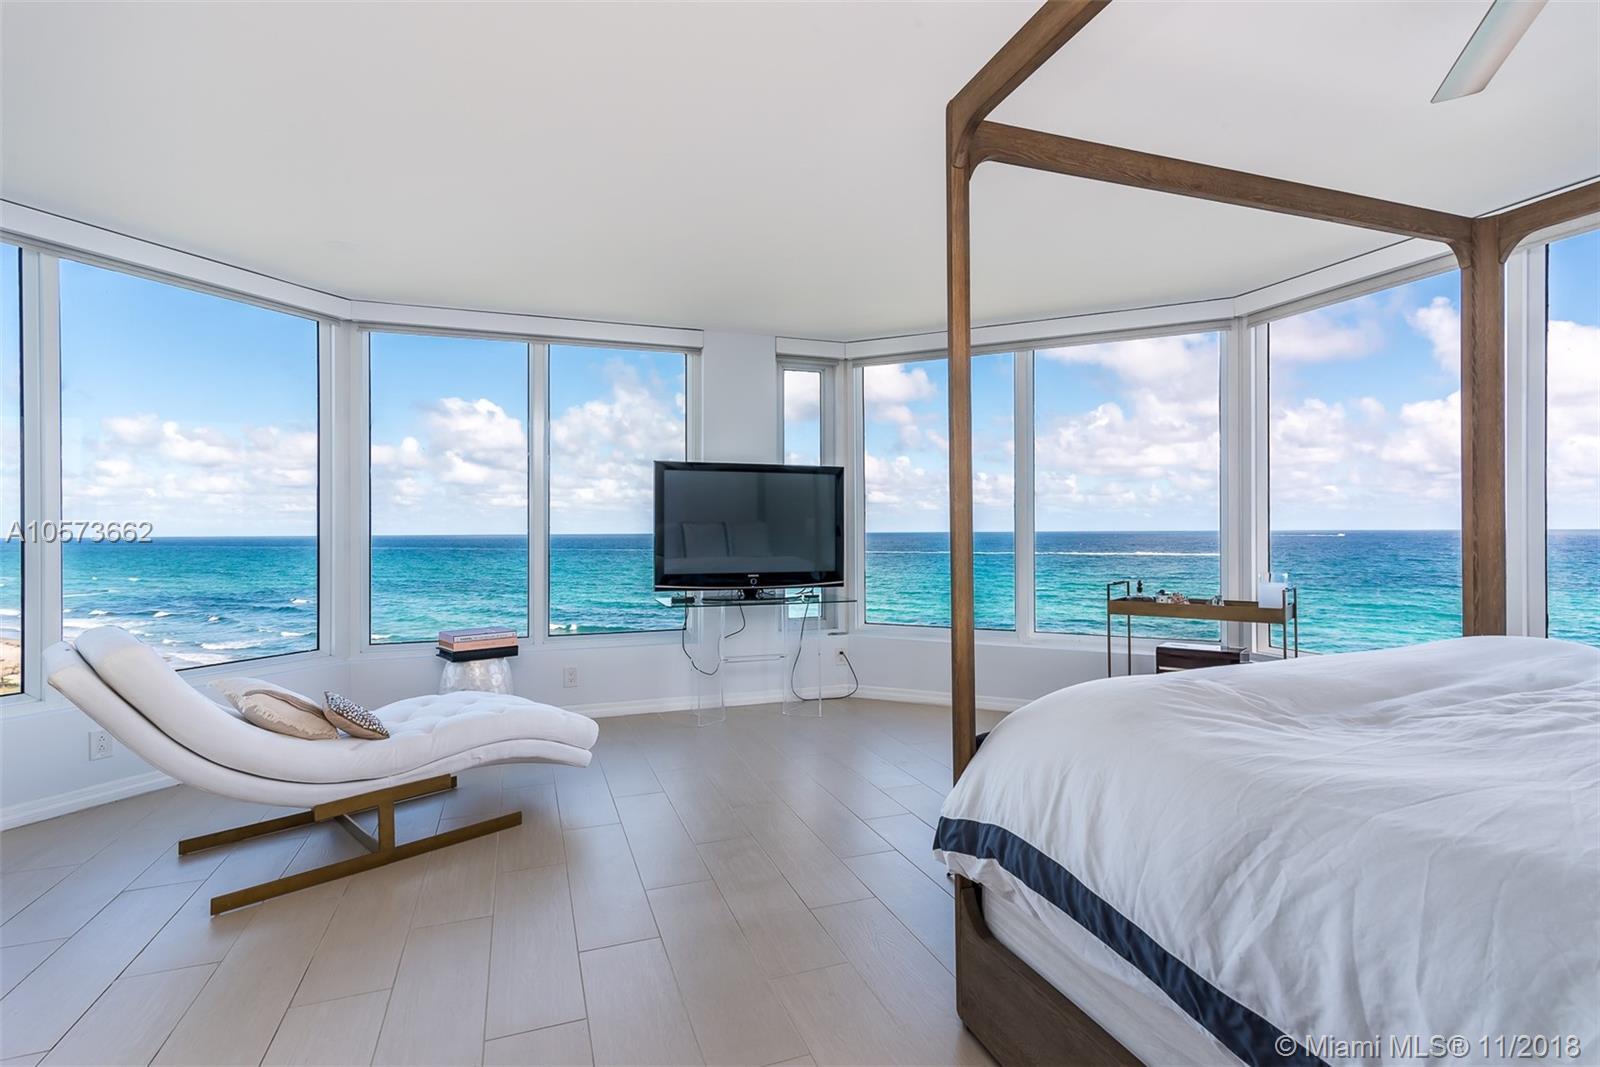 2575 S Ocean Blvd #304S, Highland Beach, FL 33487 - Highland Beach, FL real estate listing